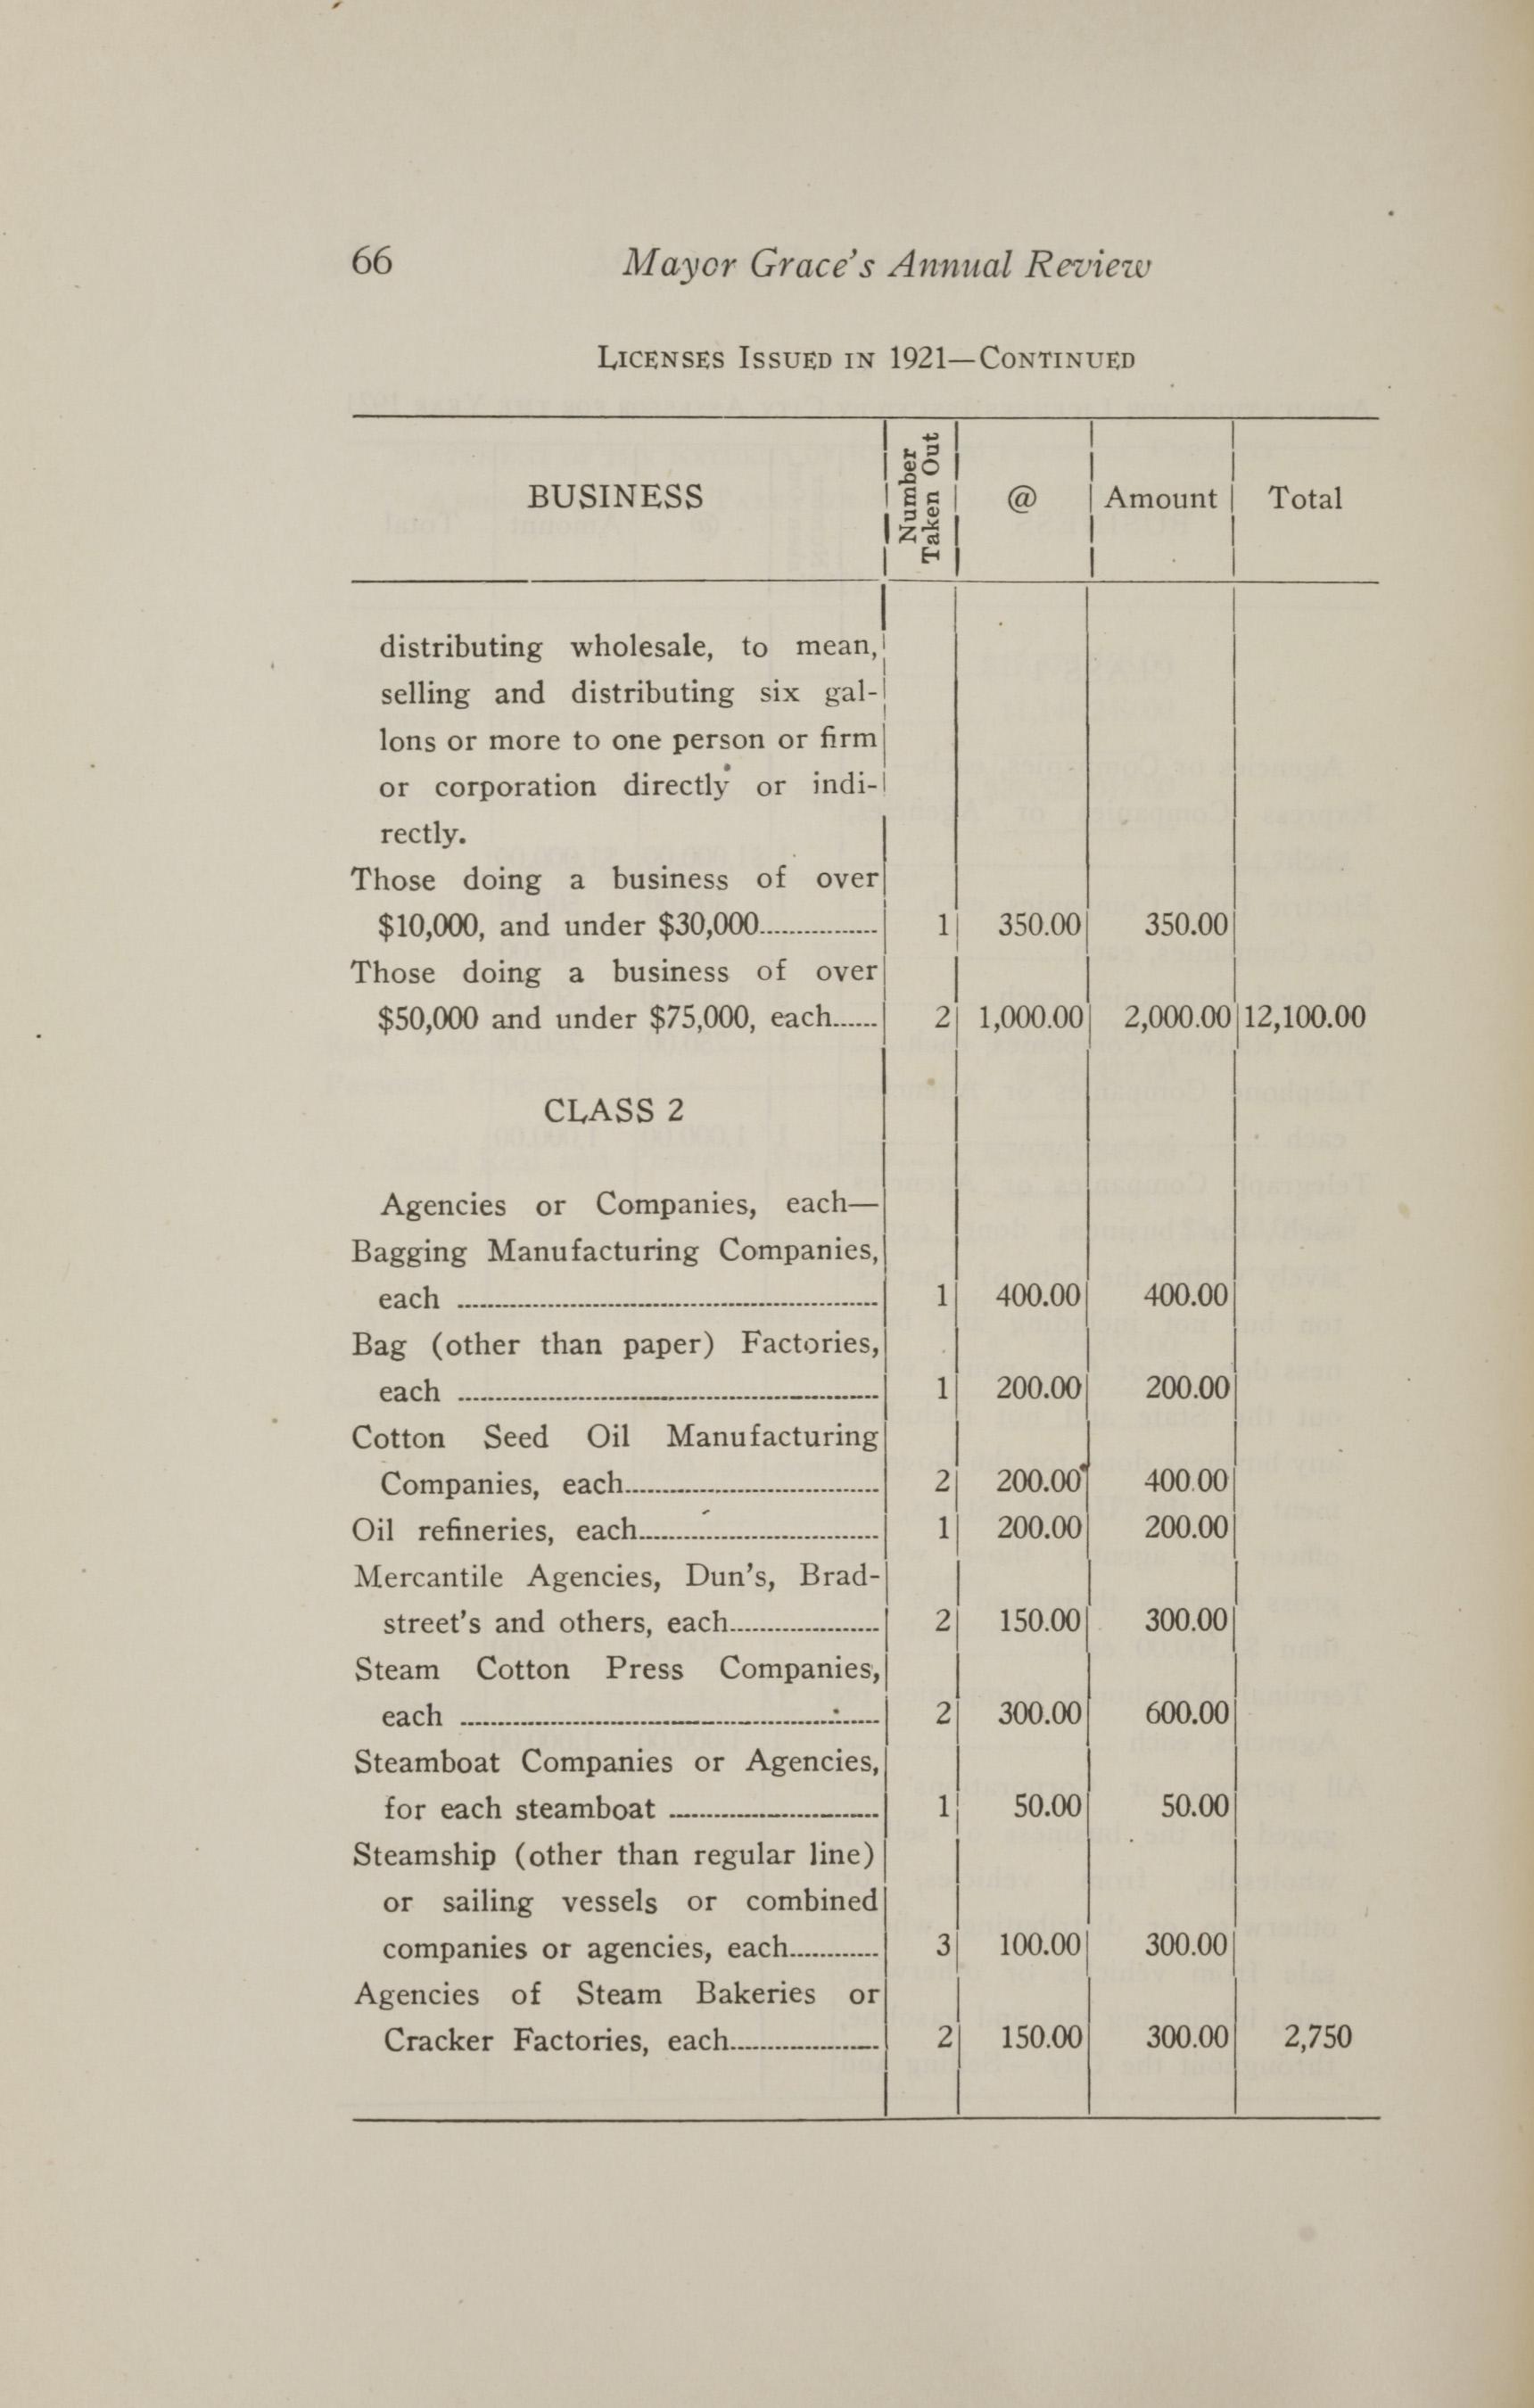 Charleston Yearbook, 1921, page 66